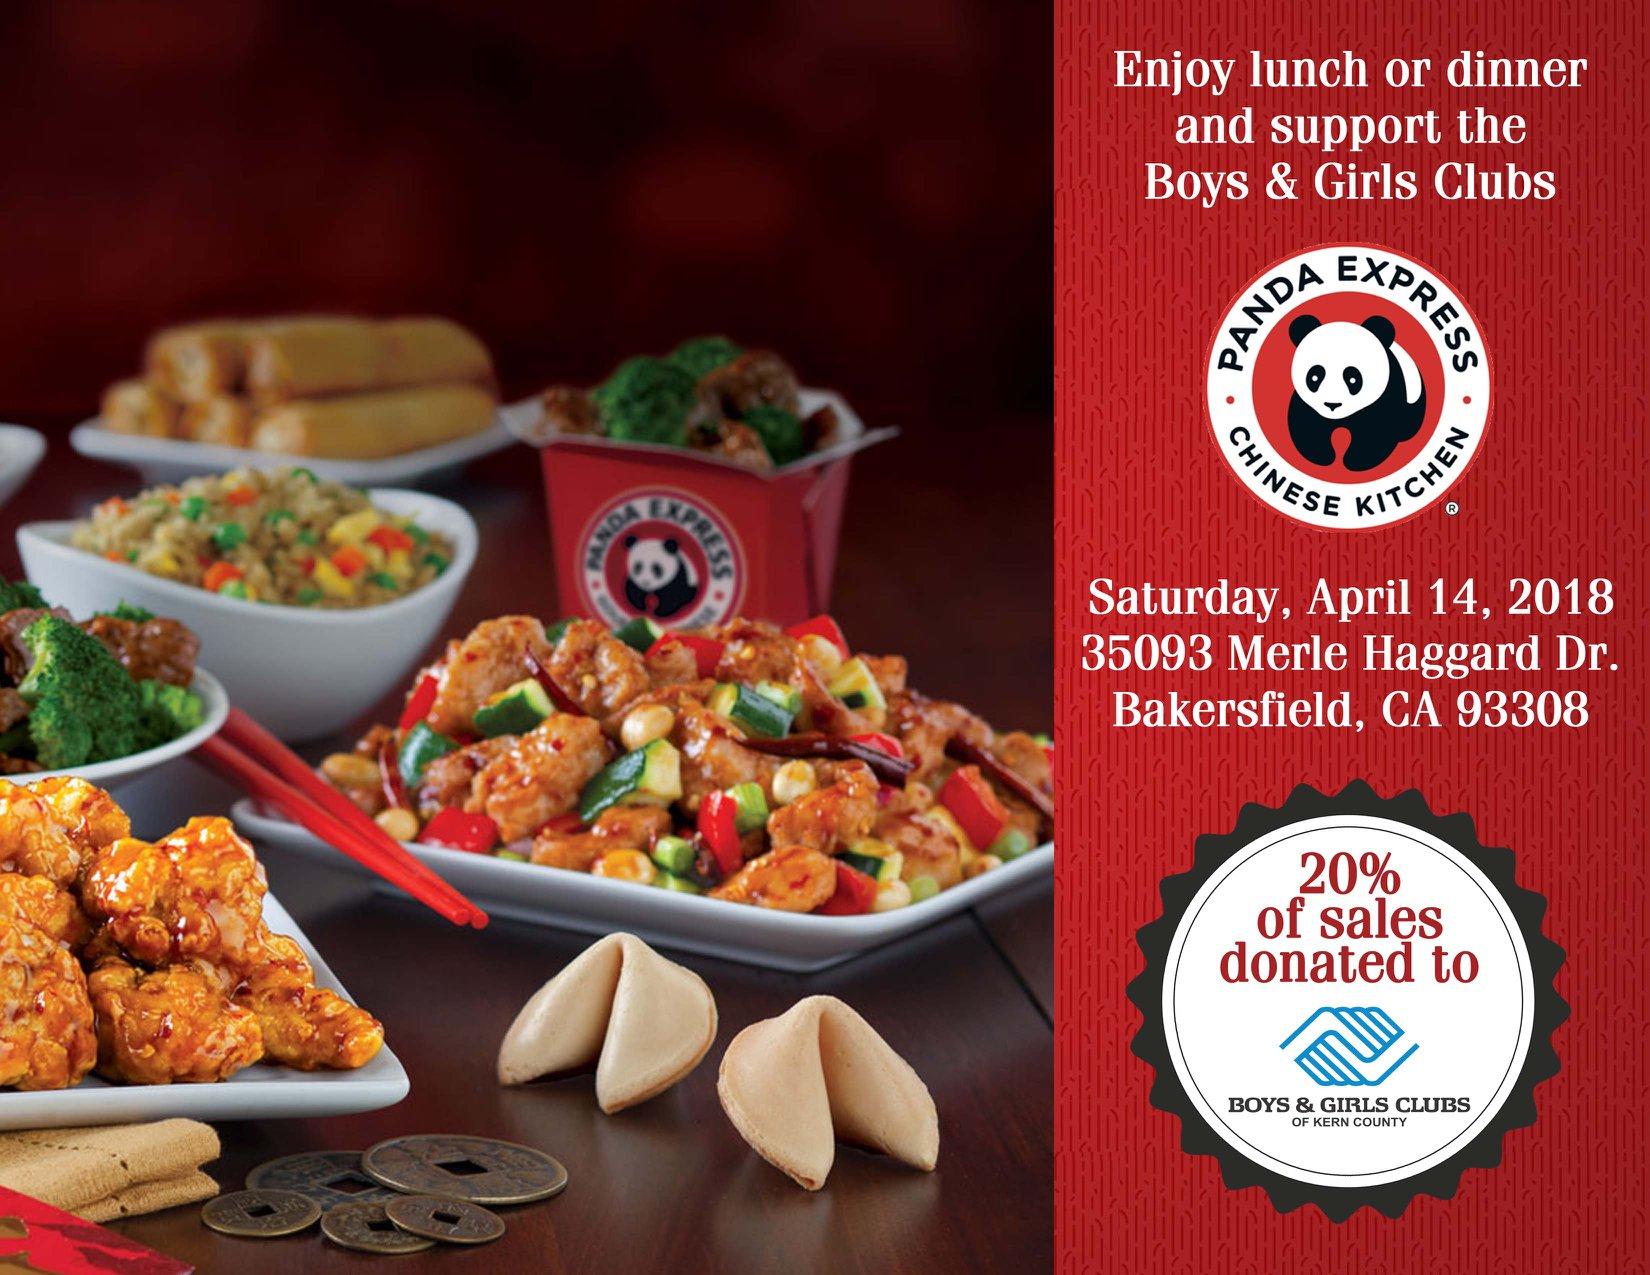 panda express fundraiser_1523652613611.jpg.jpg